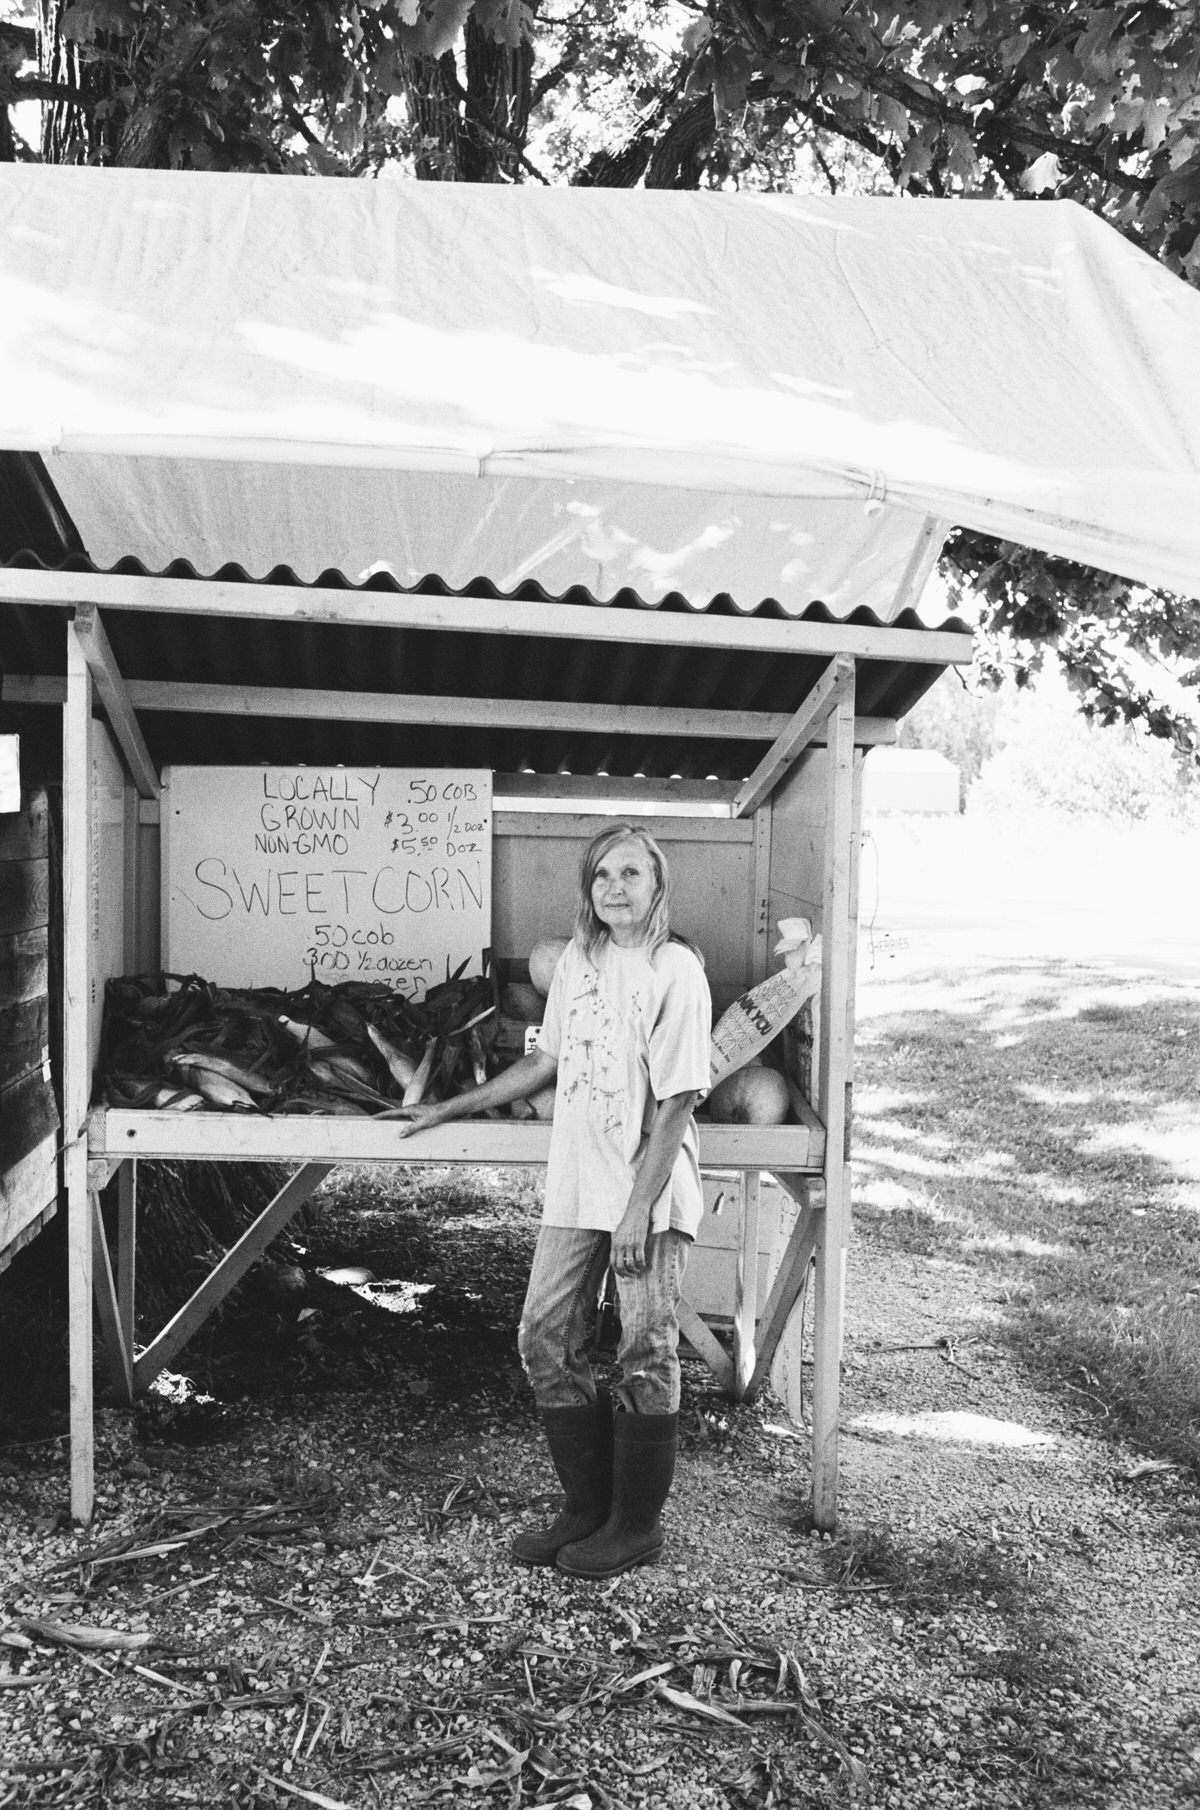 Illuminating-women_exhibition-black-and-white-fine-art-film-photography-of-Wisconsin-farmer-Colleen-Lubbert-by-Studio-L-photographer-Laura-Schneider-_016